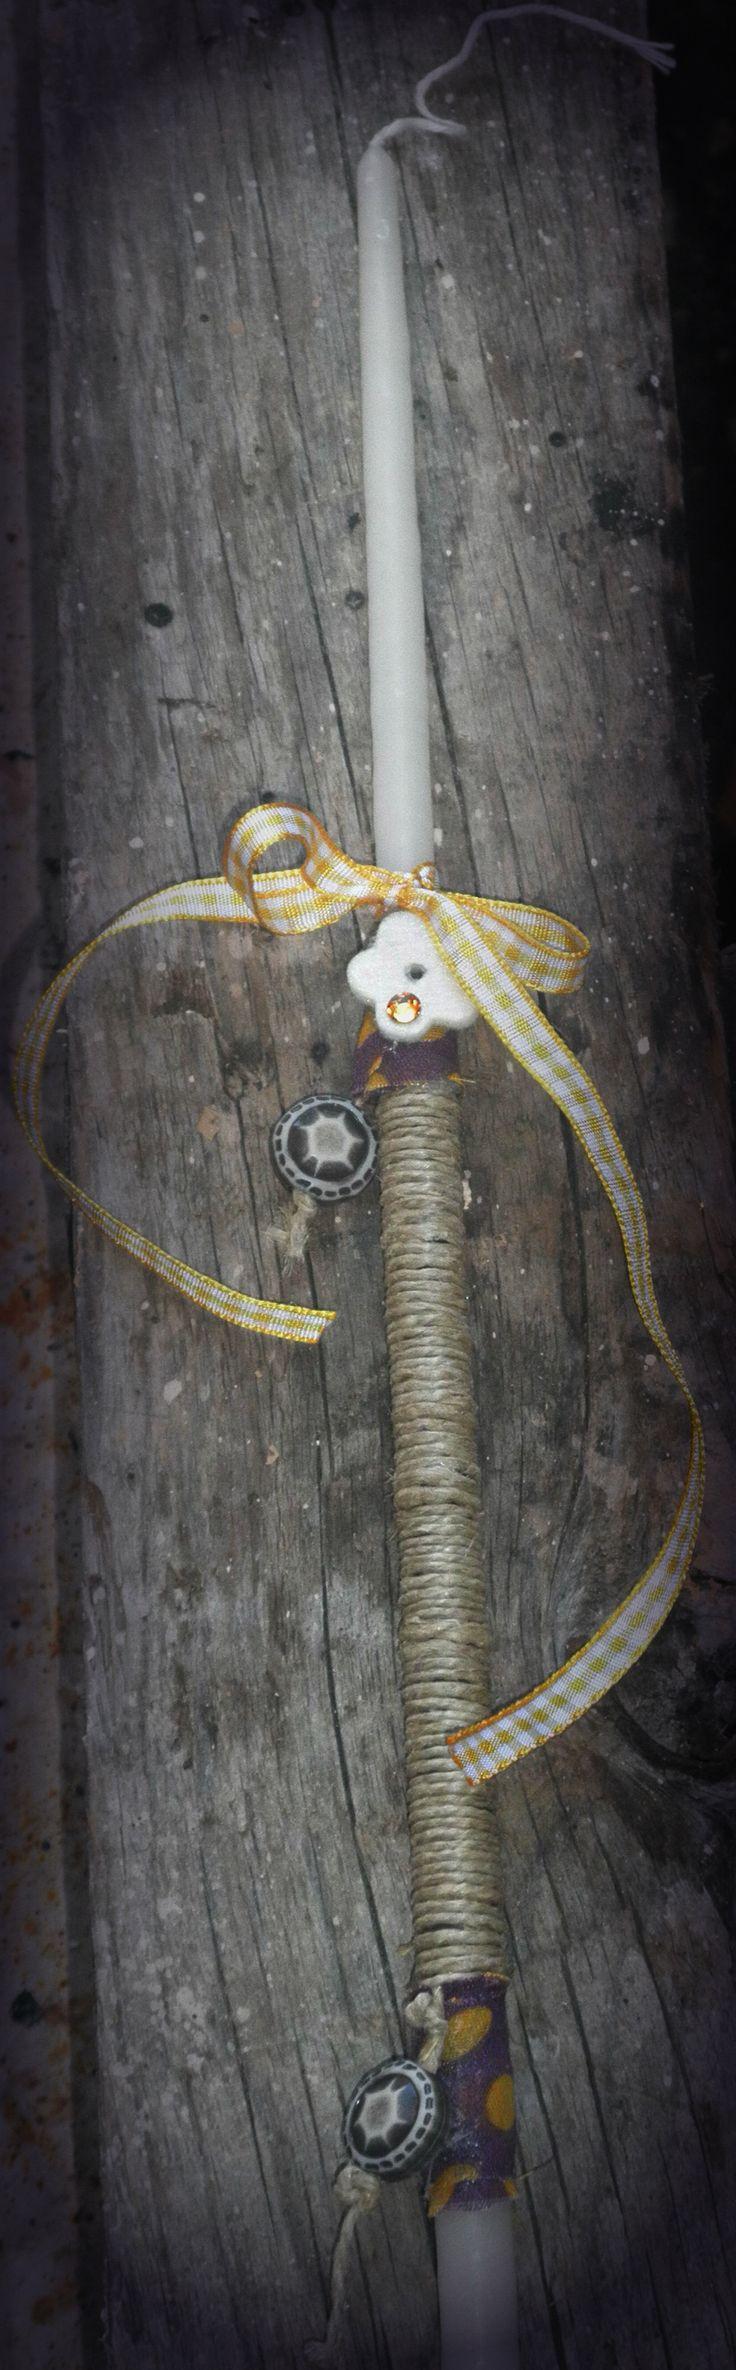 handmade easter candle by K.ompo.S- Handmade Jewel